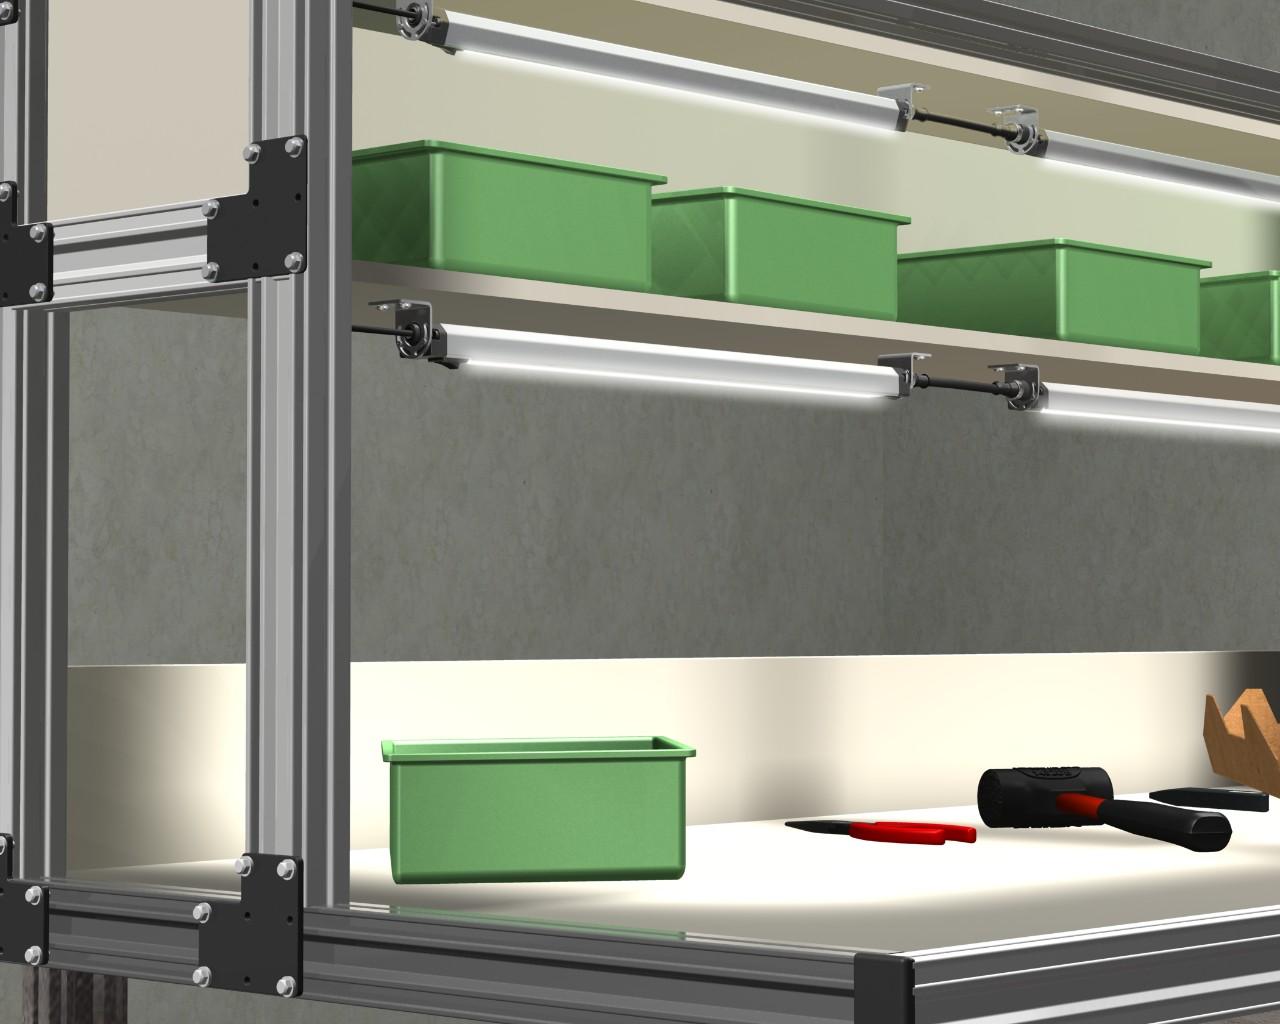 Revisa la serie WLB32 con LED industrial de Banner engeenering